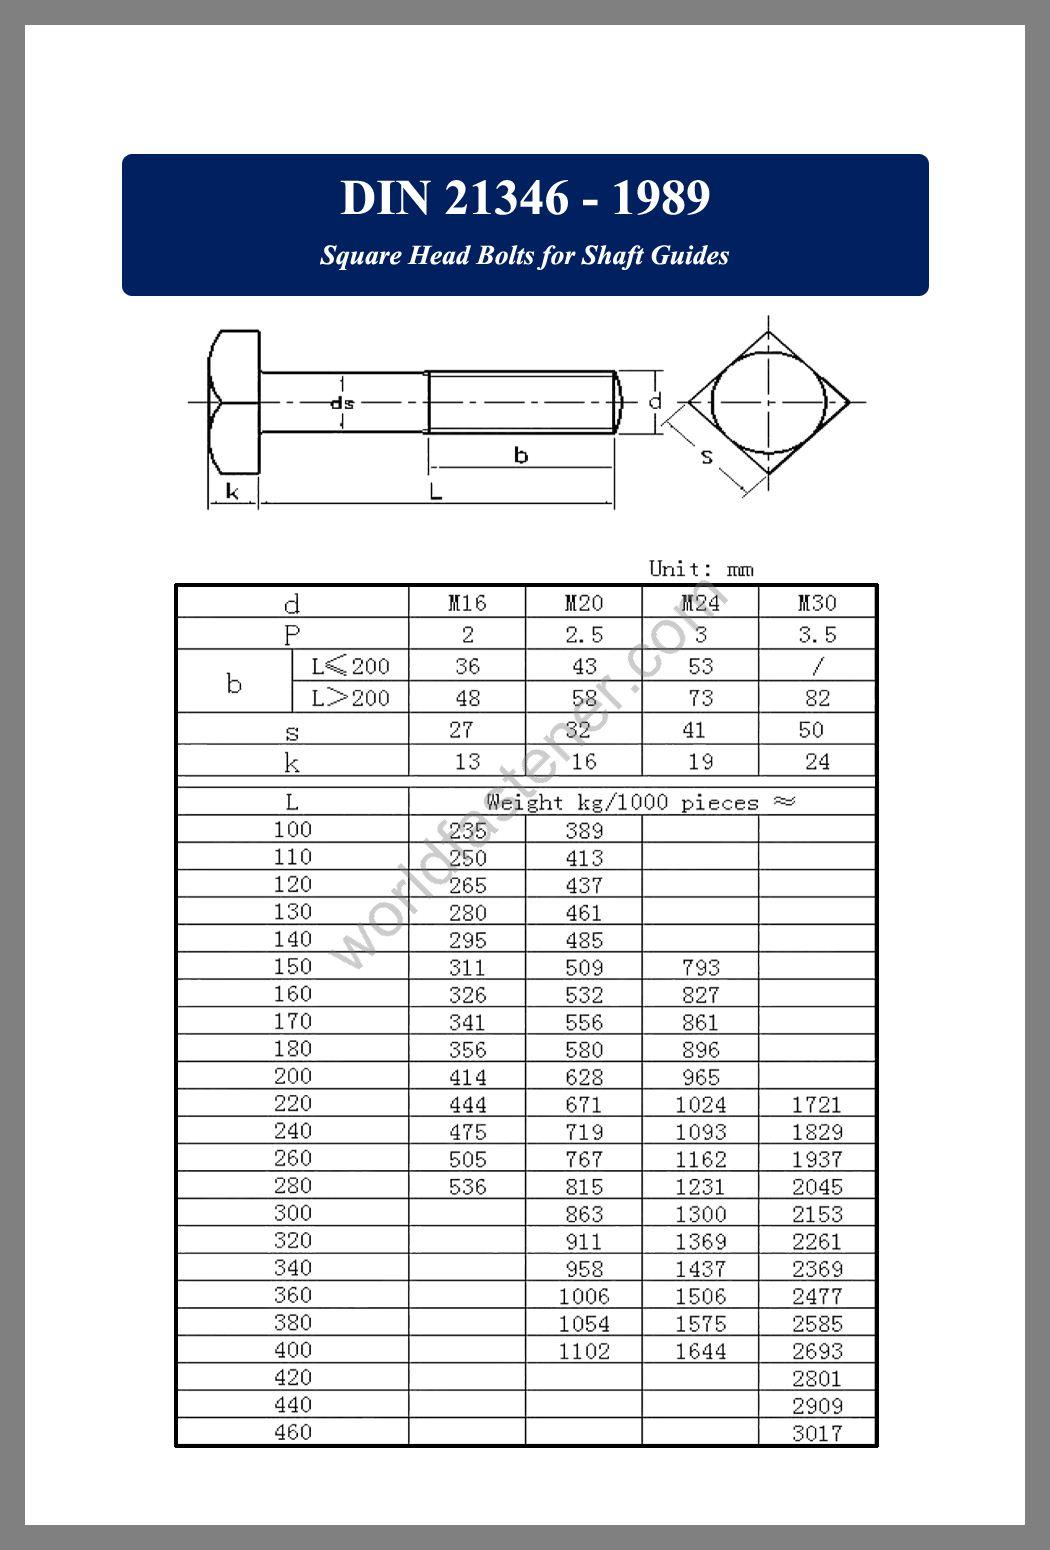 DIN 21346, DIN 21346 Square Head Bolts, fastener, screw, bolt